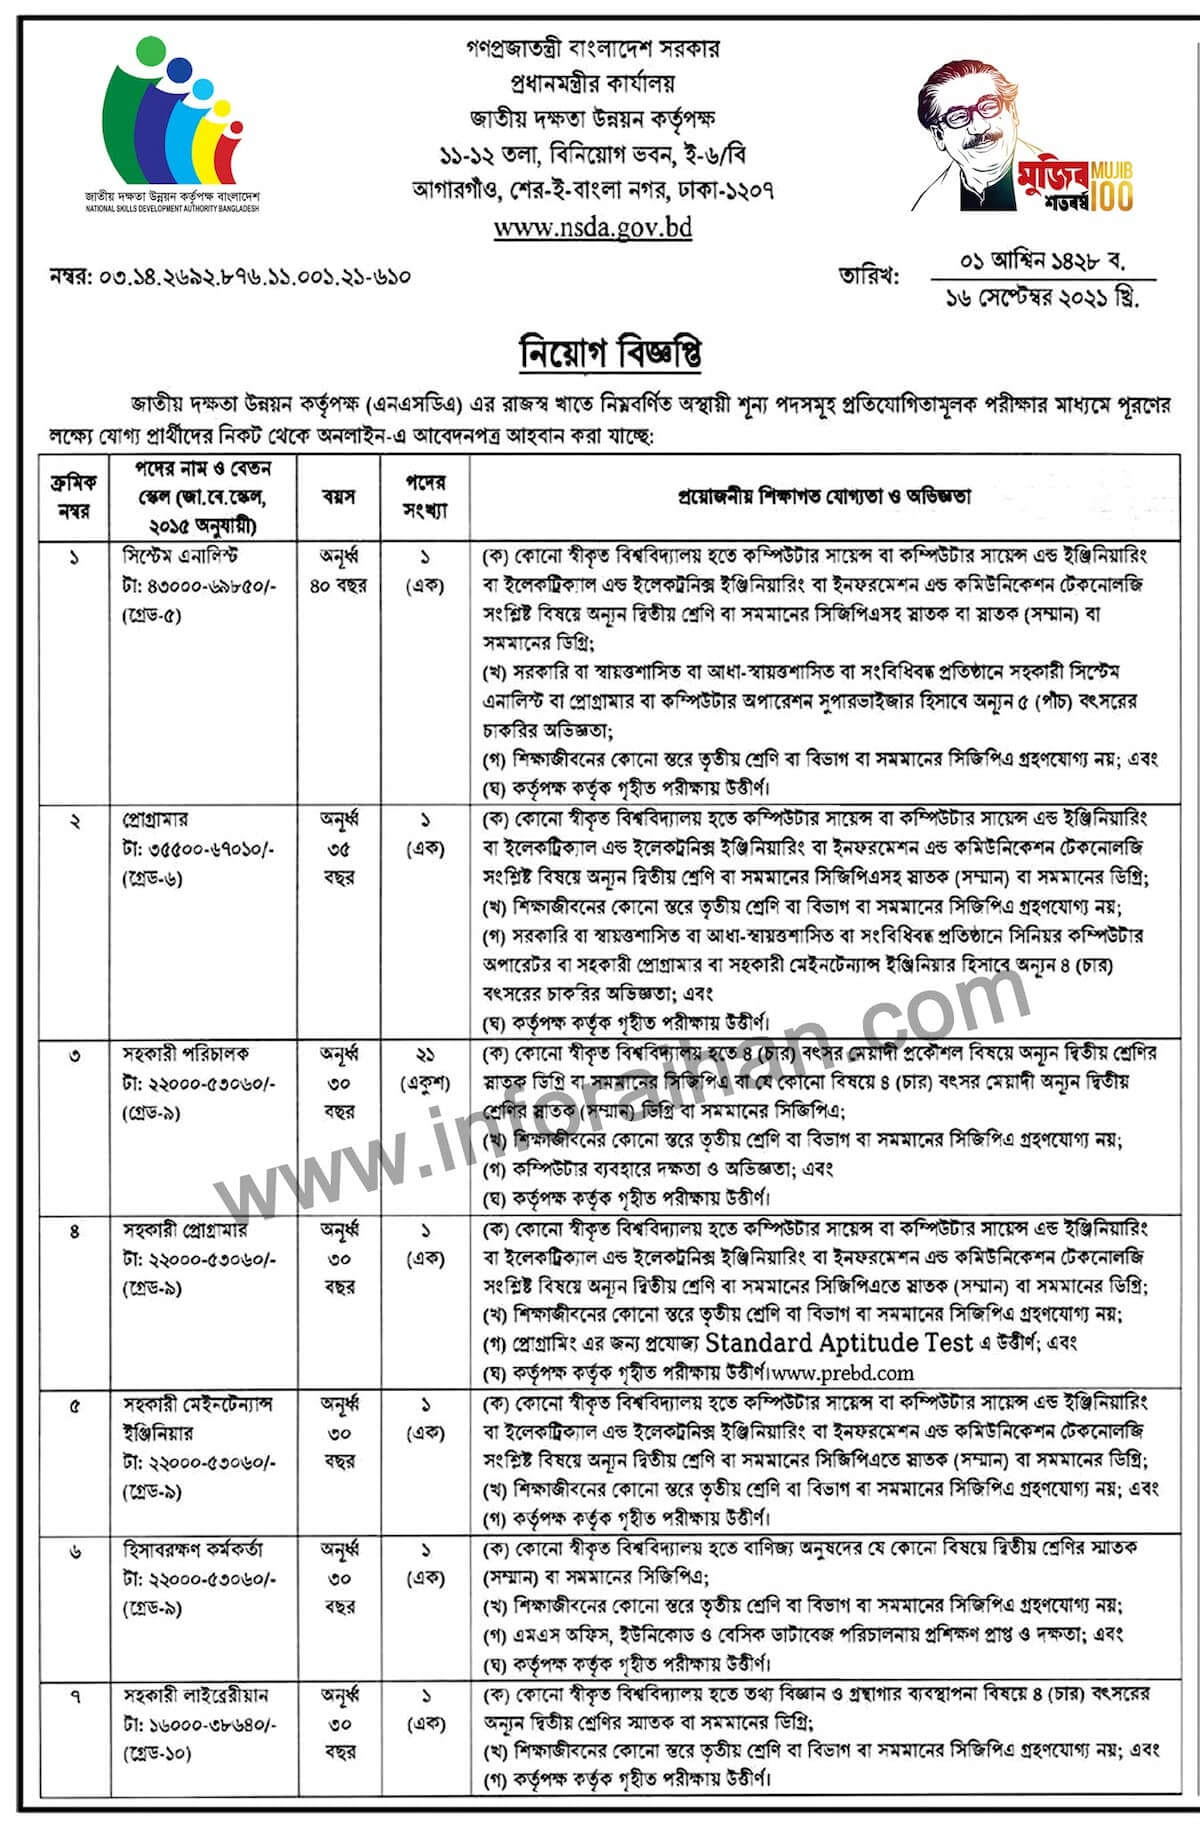 Bangladesh Gas Fields Company Job Circular image 2021